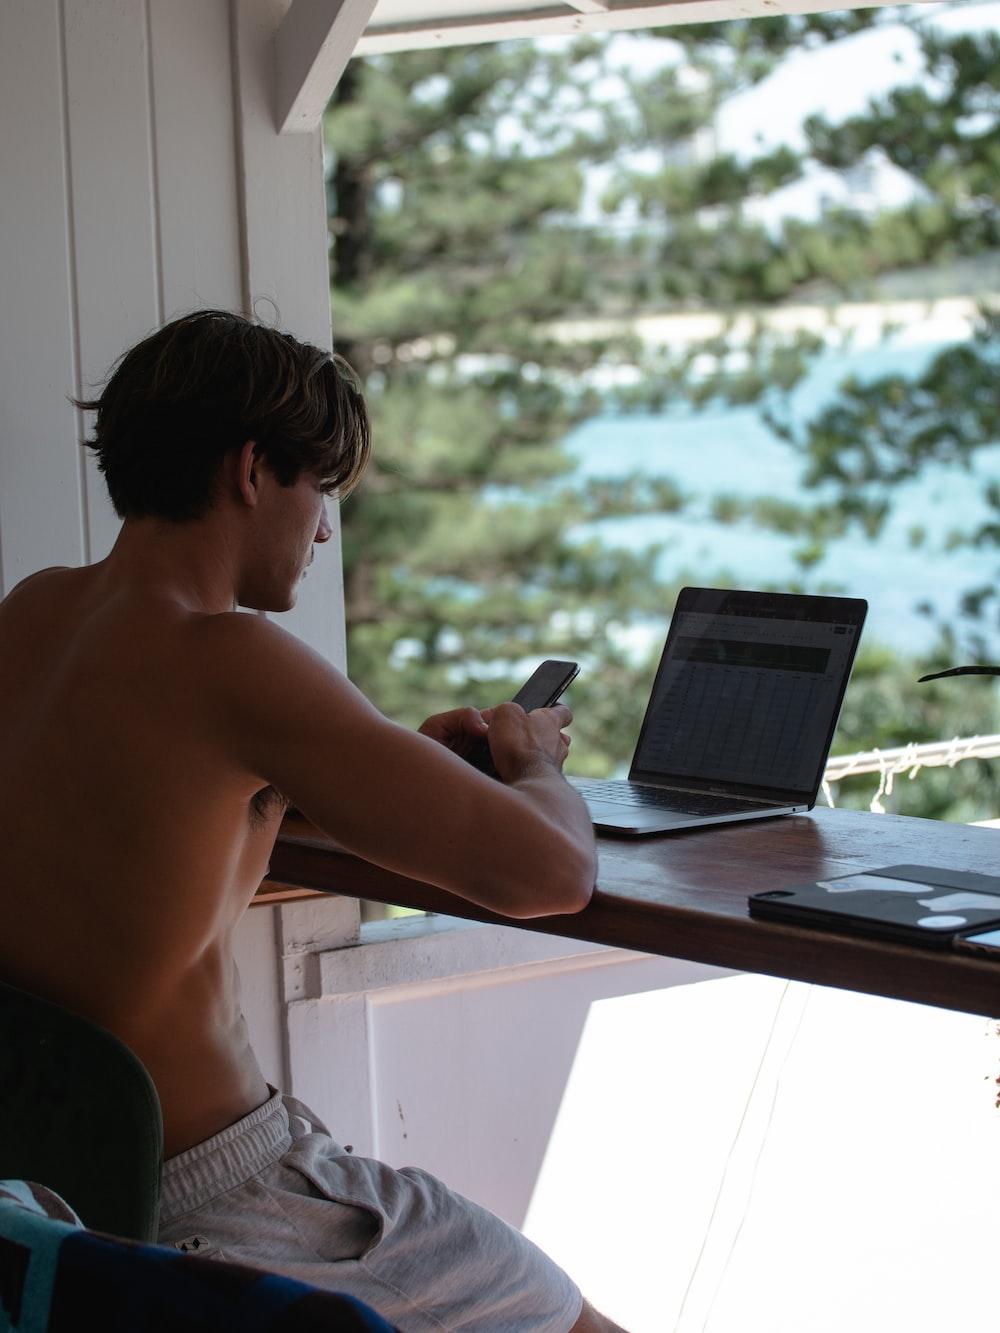 topless man using black laptop computer